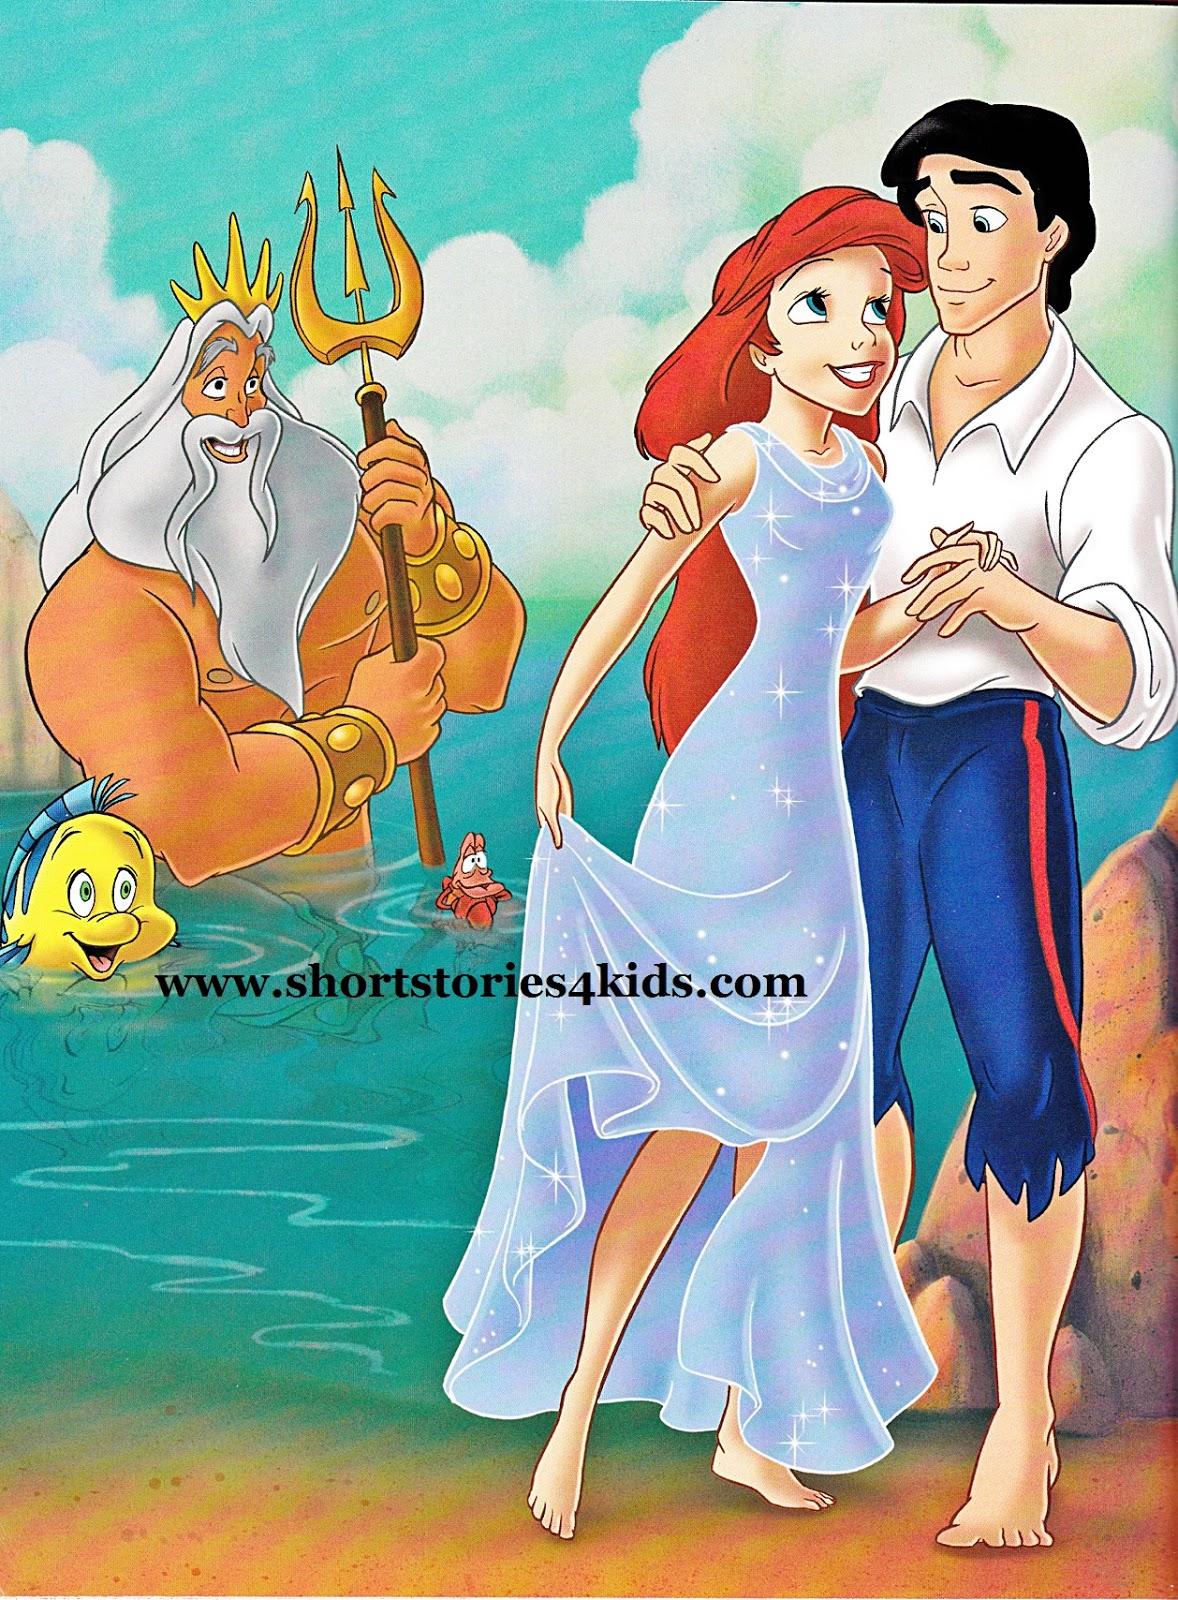 the little mermaid english short stories for kids short stories